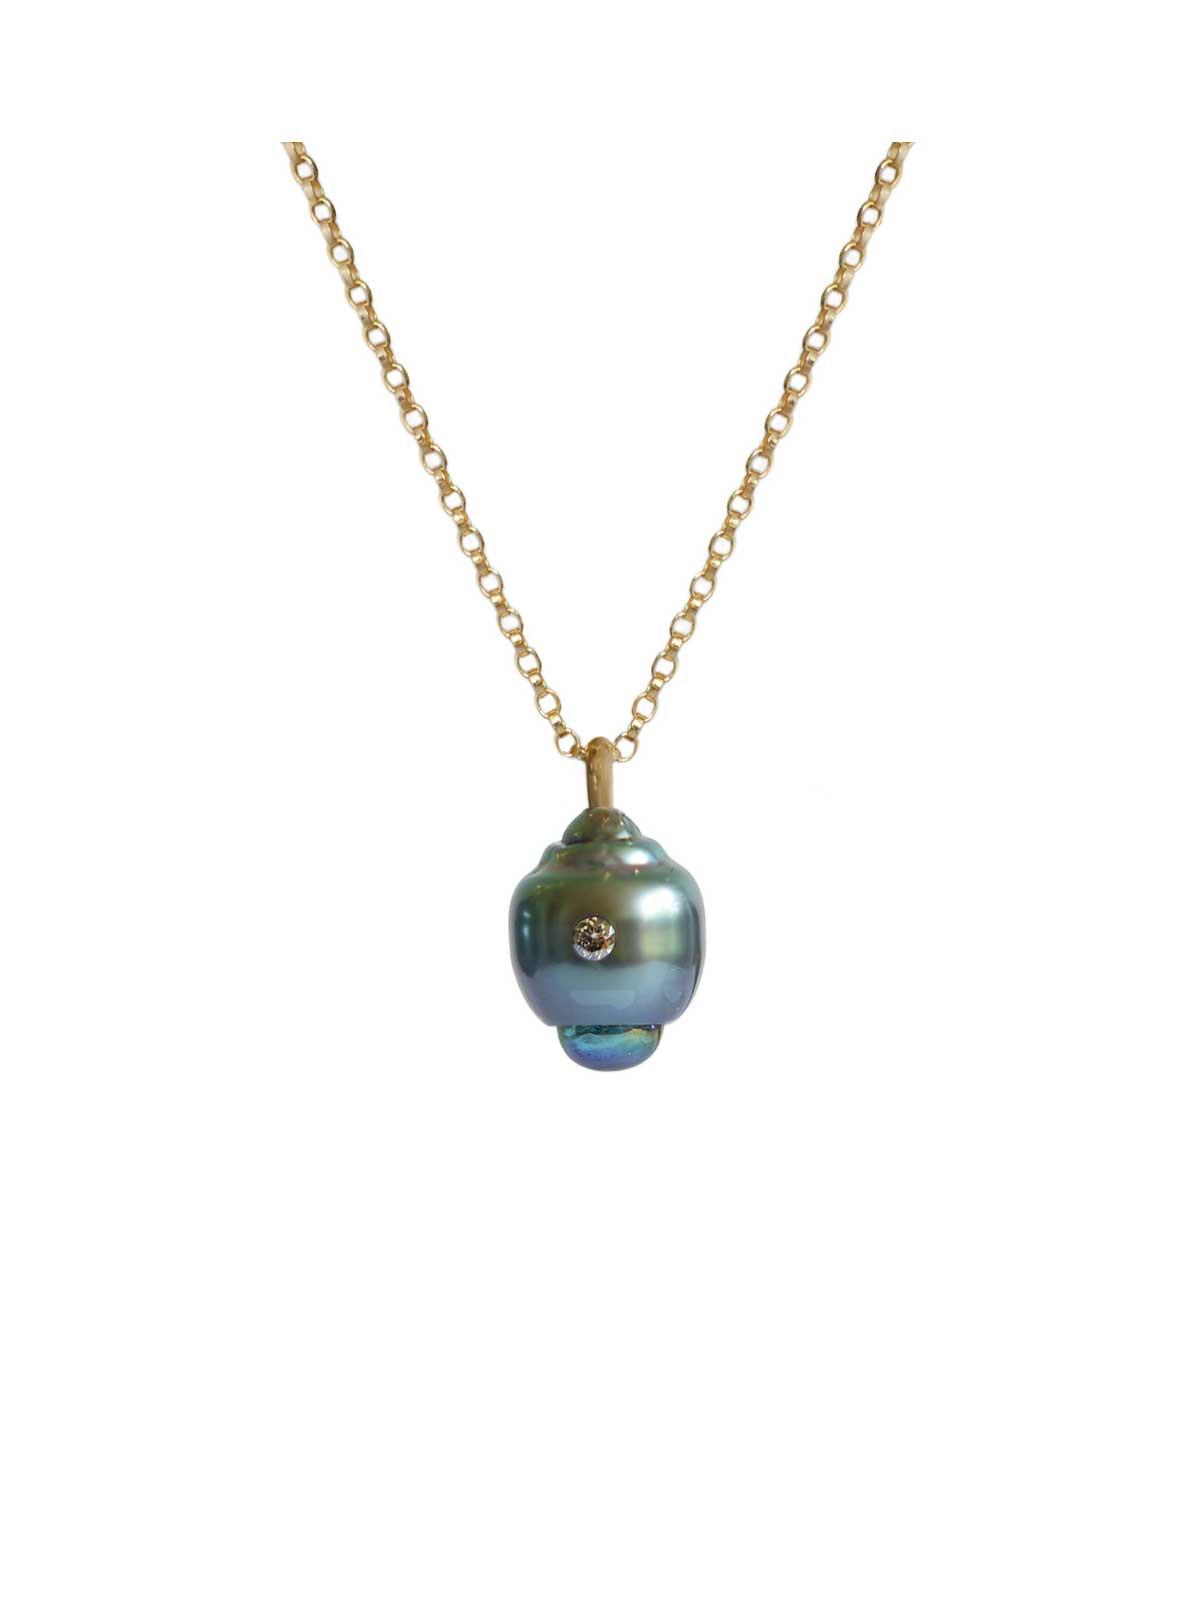 boudoir pendentif perle de tahiti topaze Diamant or jaune 14 carats